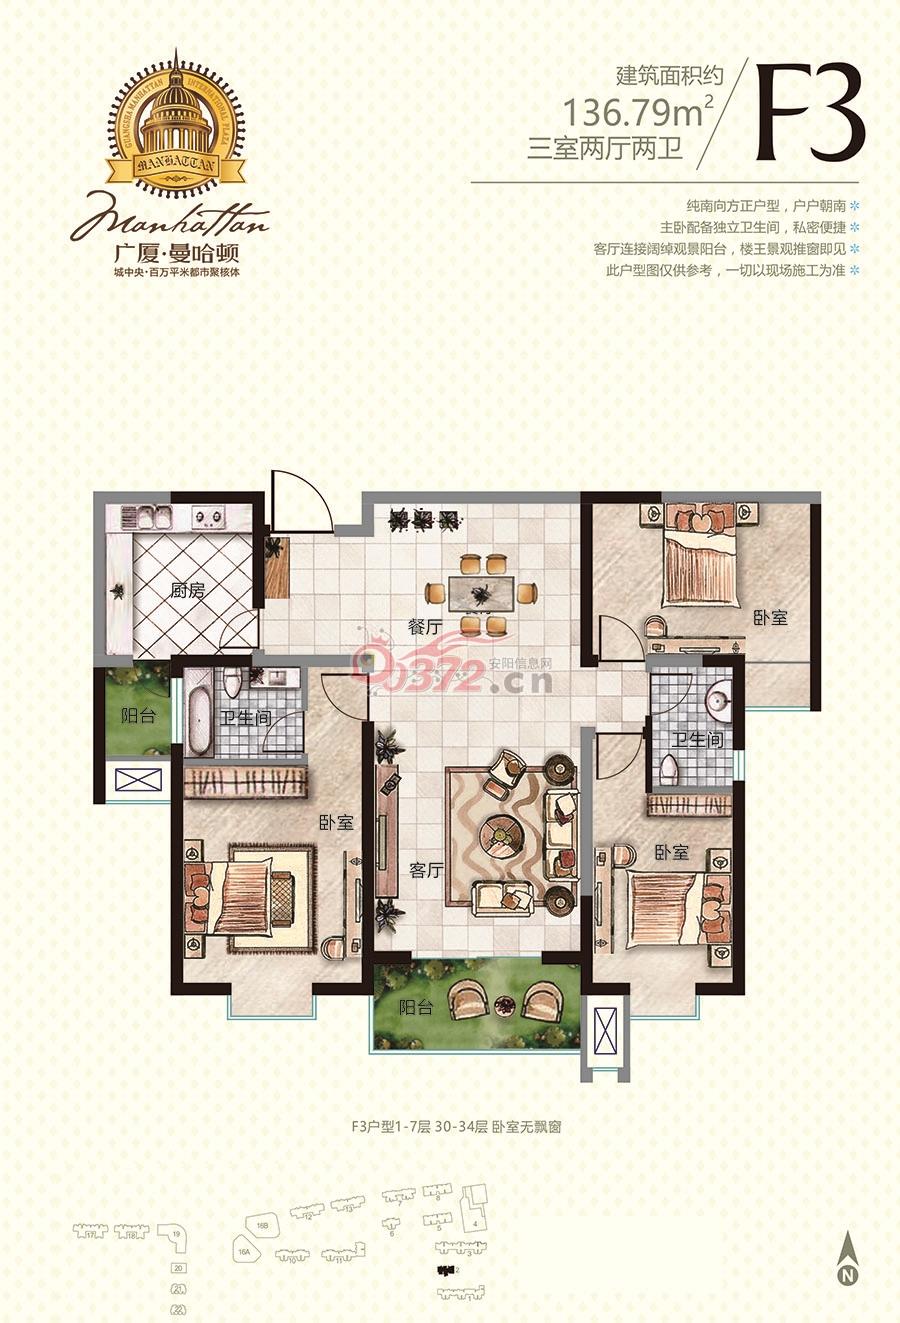 曼哈顿F3户型 3室136.79m²